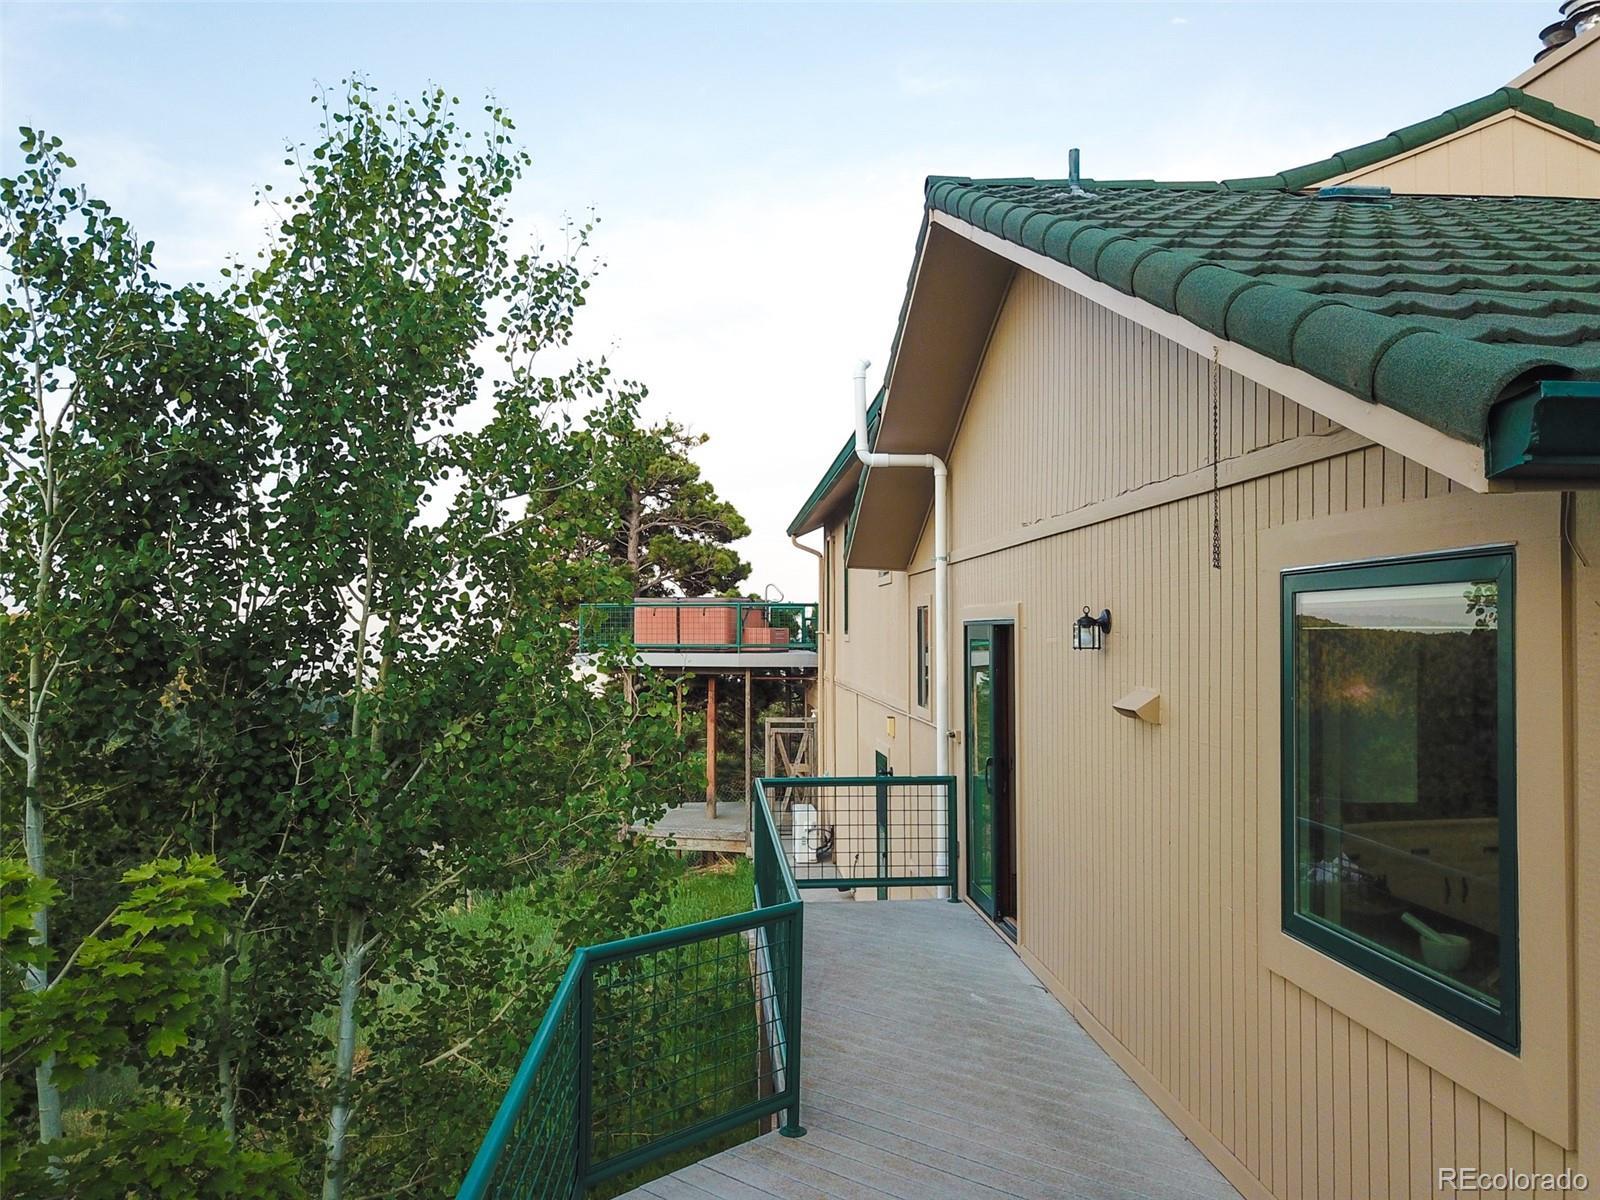 MLS# 1691148 - 33 - 384 Deer Trail Road, Boulder, CO 80302